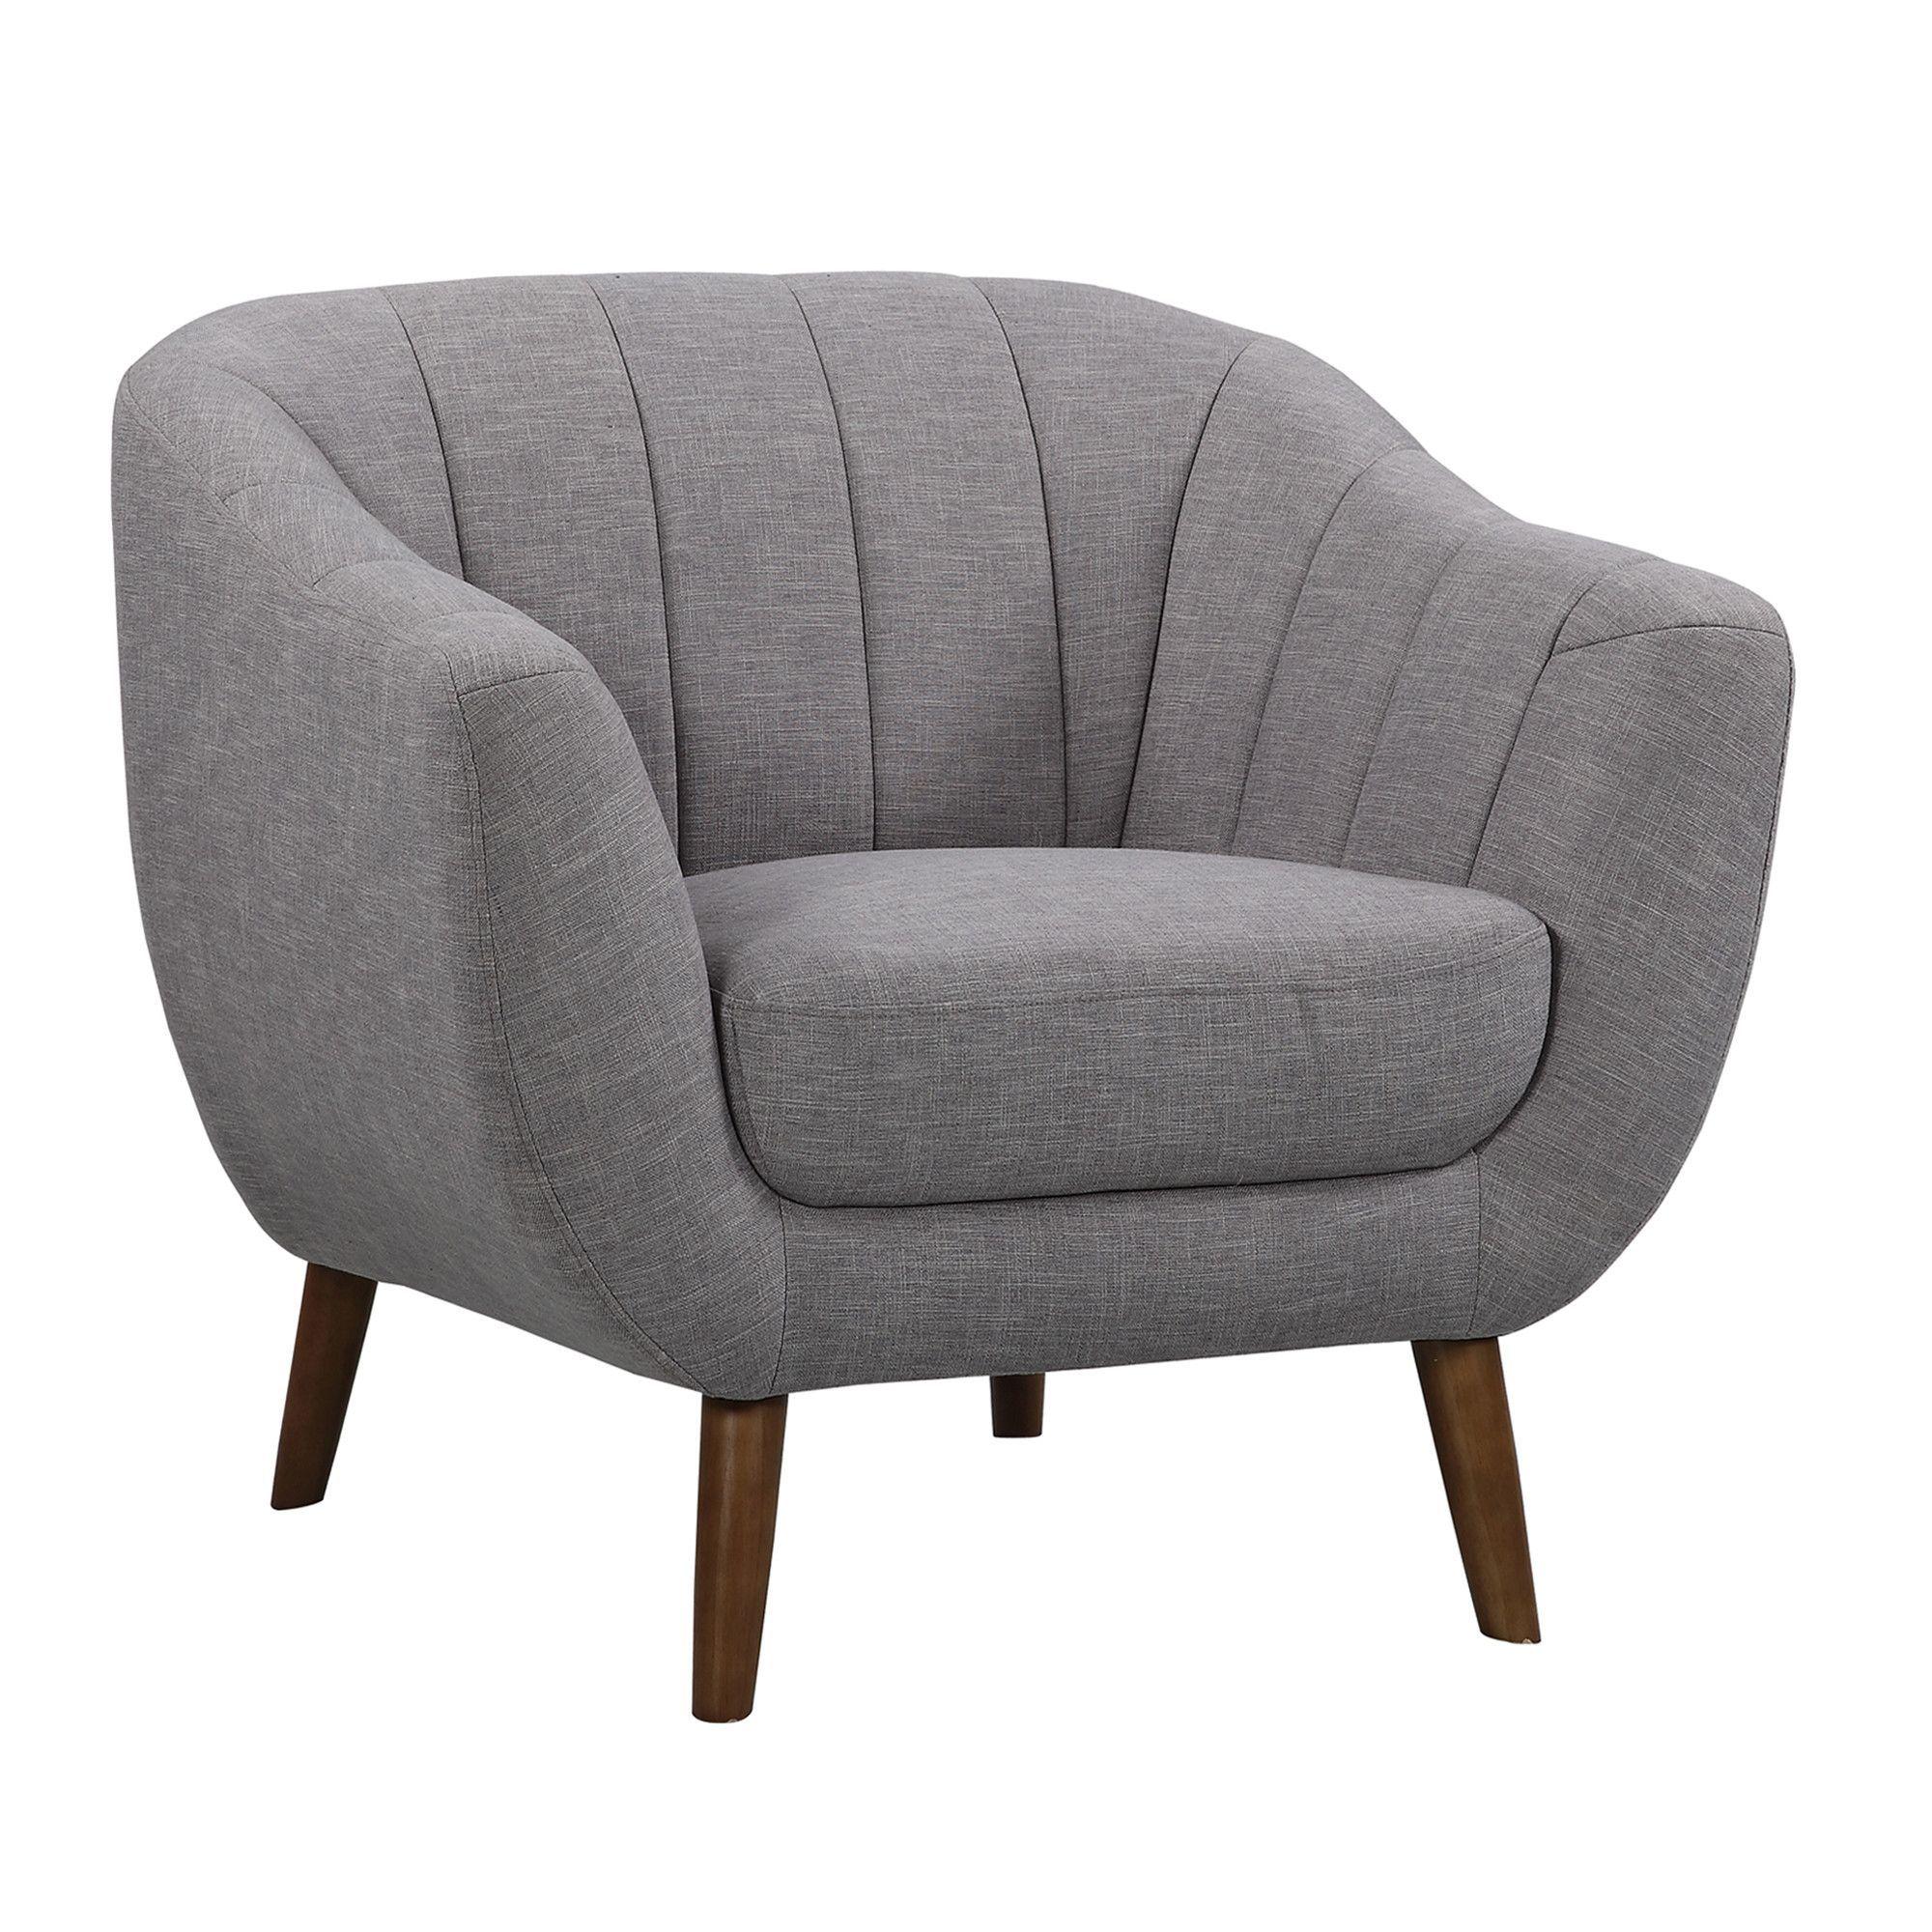 Armen living javeline midcentury contemporary chair in light gray